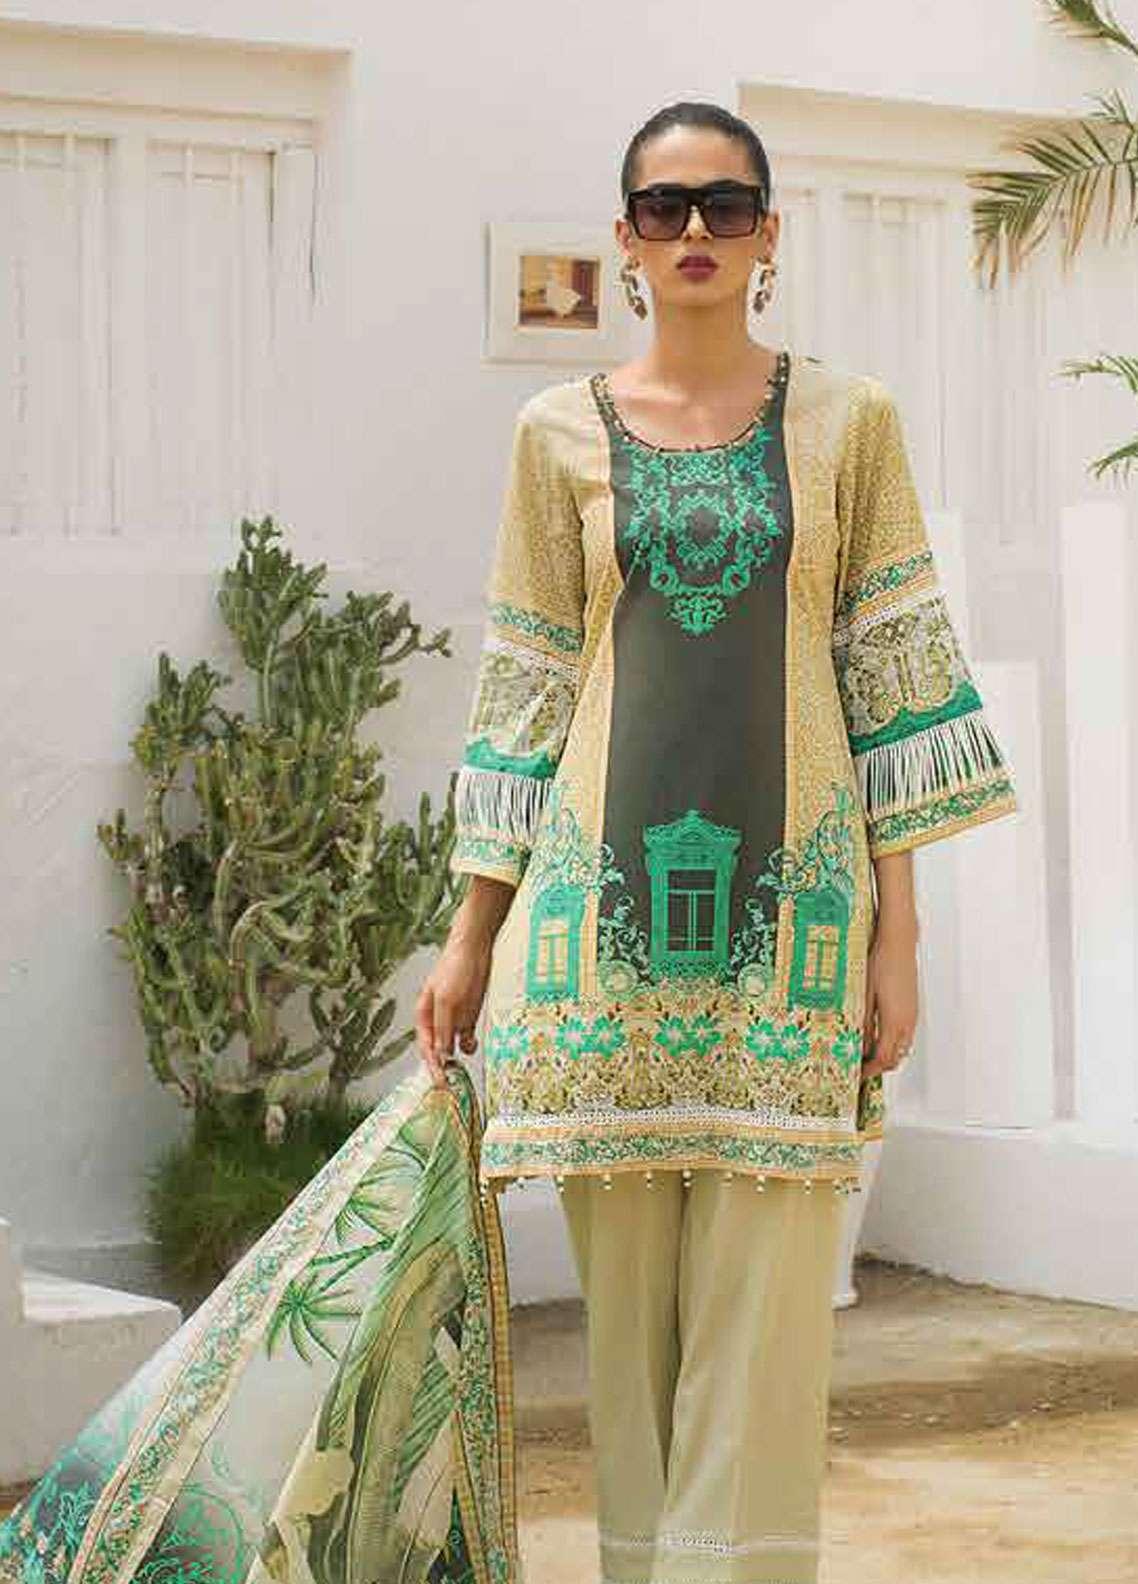 Al Zohaib Printed Lawn Unstitched 3 Piece Suit AZC19L 8B - Spring / Summer Collection